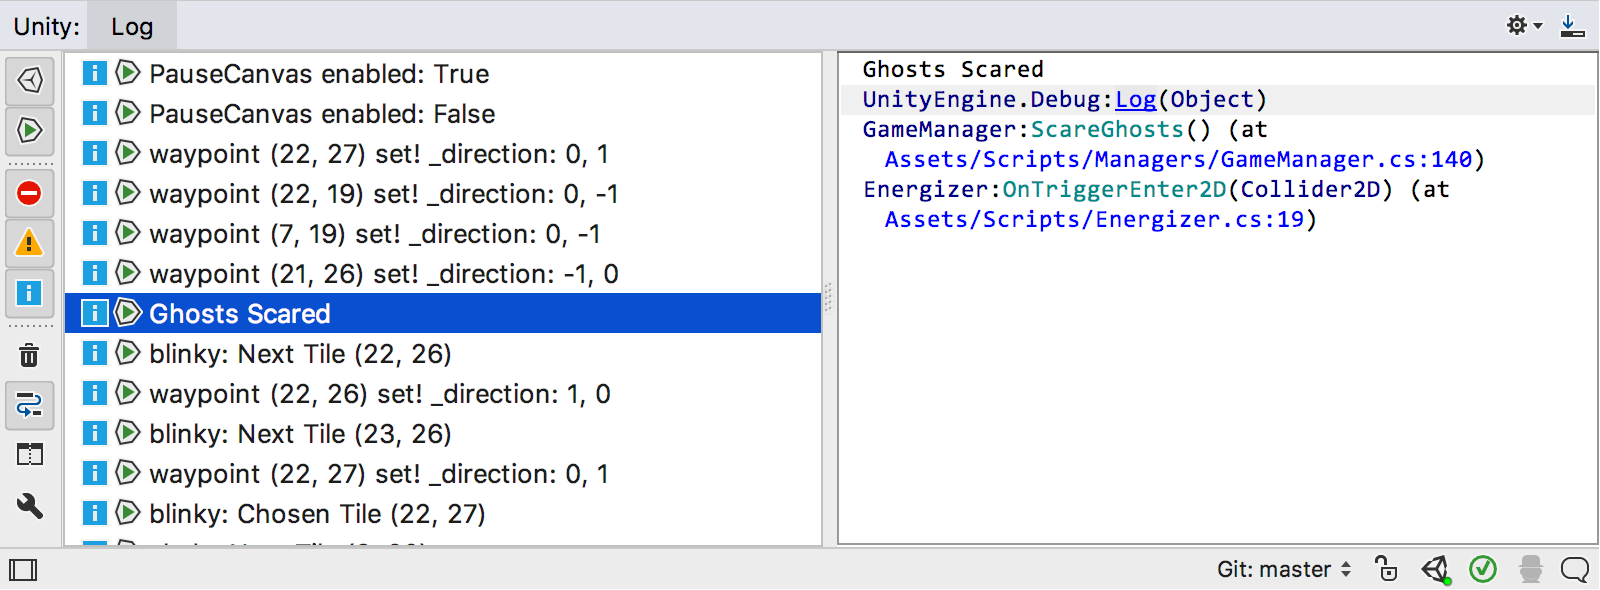 Unity log viewer tool window